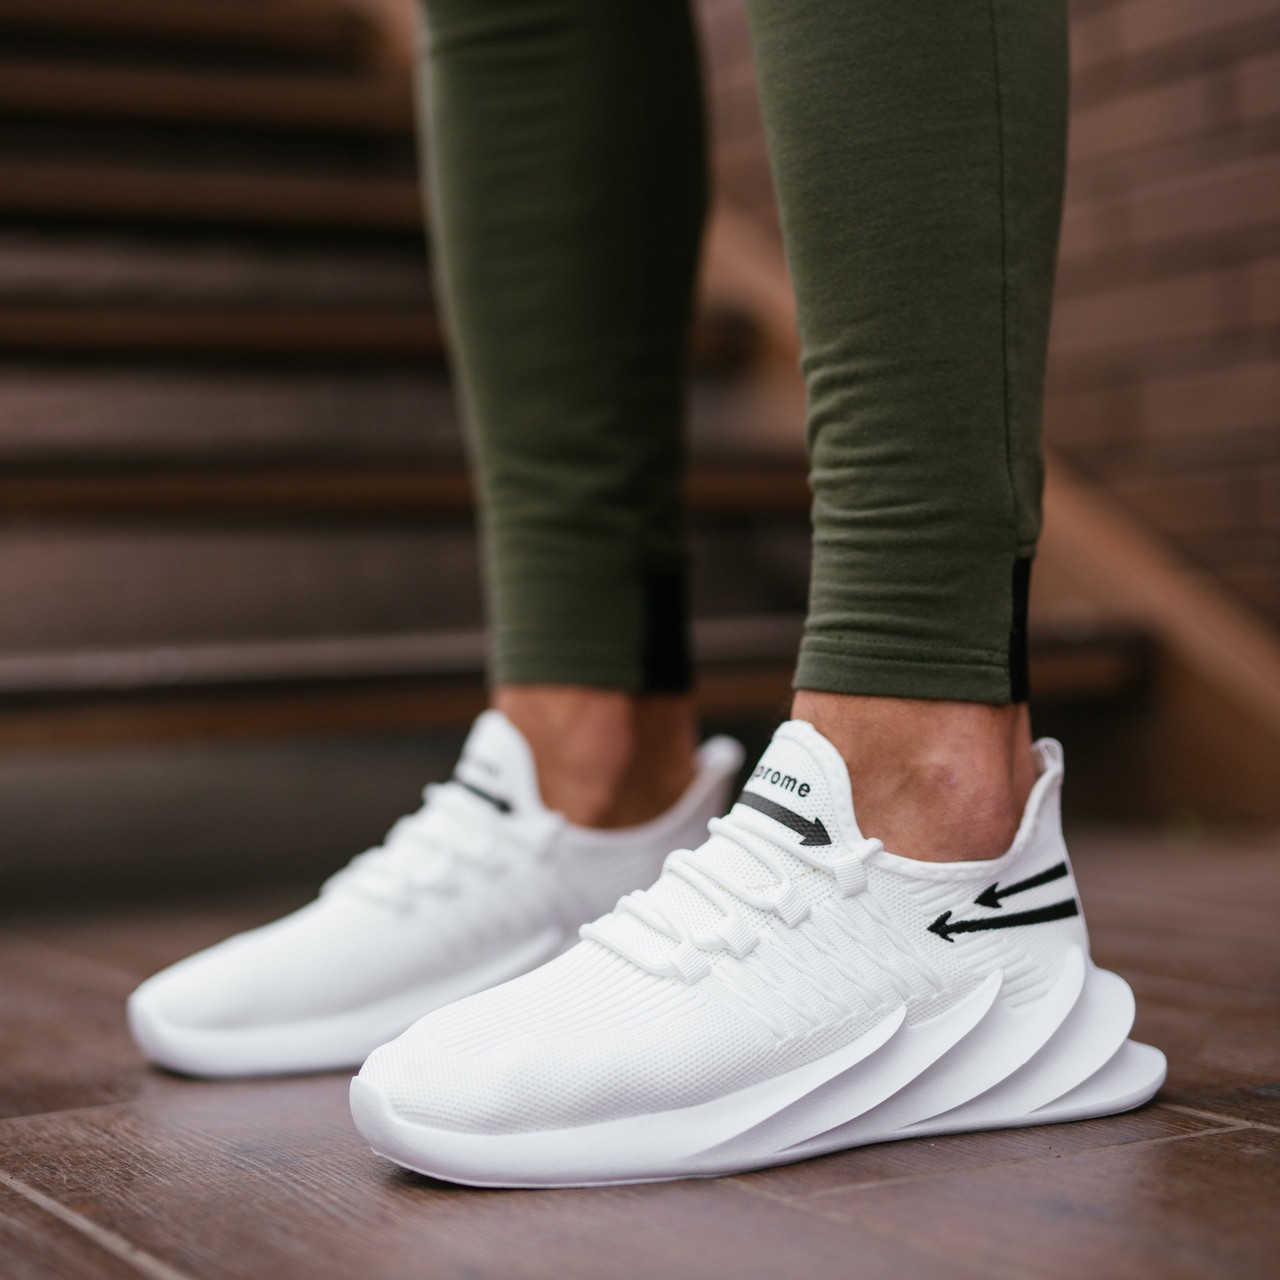 Мужские летние белые кроссовки на шнурках. Летние мужские текстильные кроссы